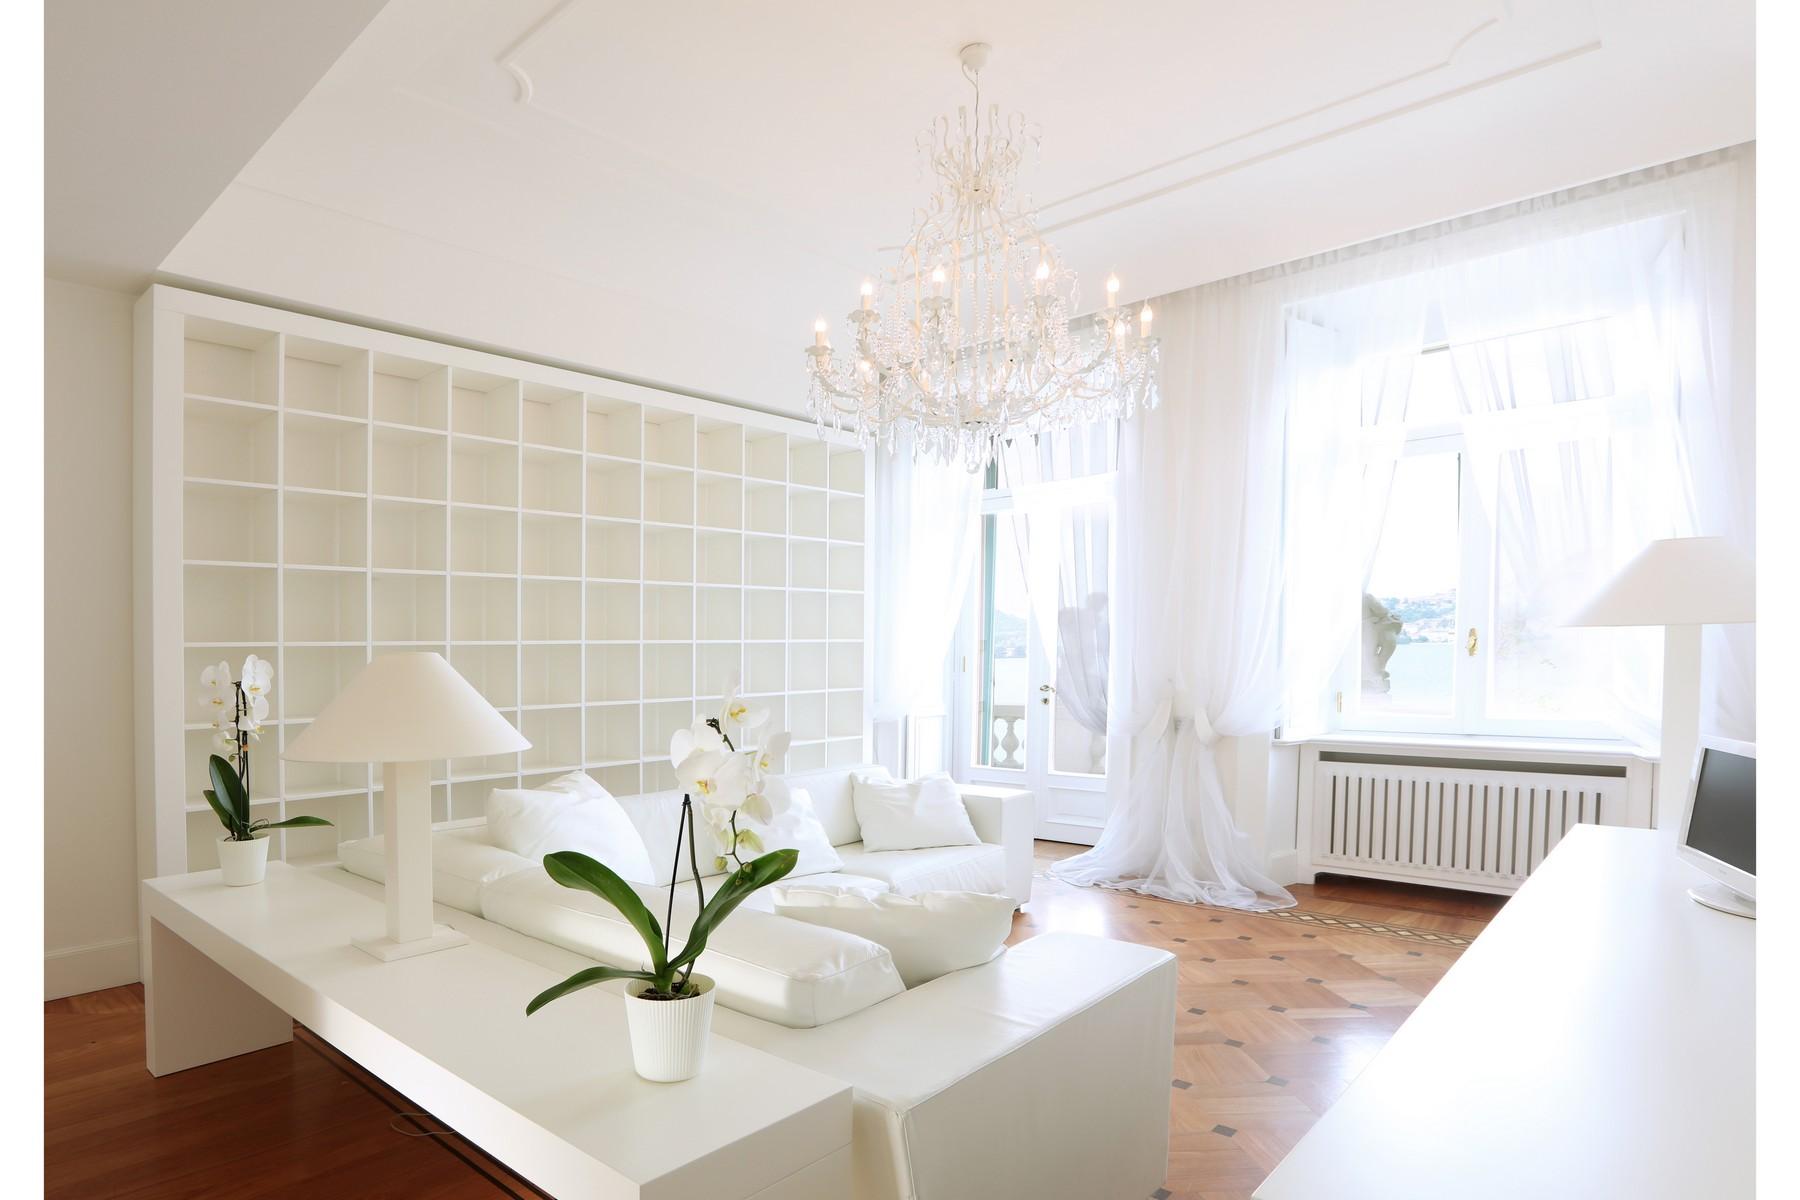 Additional photo for property listing at Prestigious apartment in period villa on Lake Como Via Caronti Blevio, Como 22020 Italie